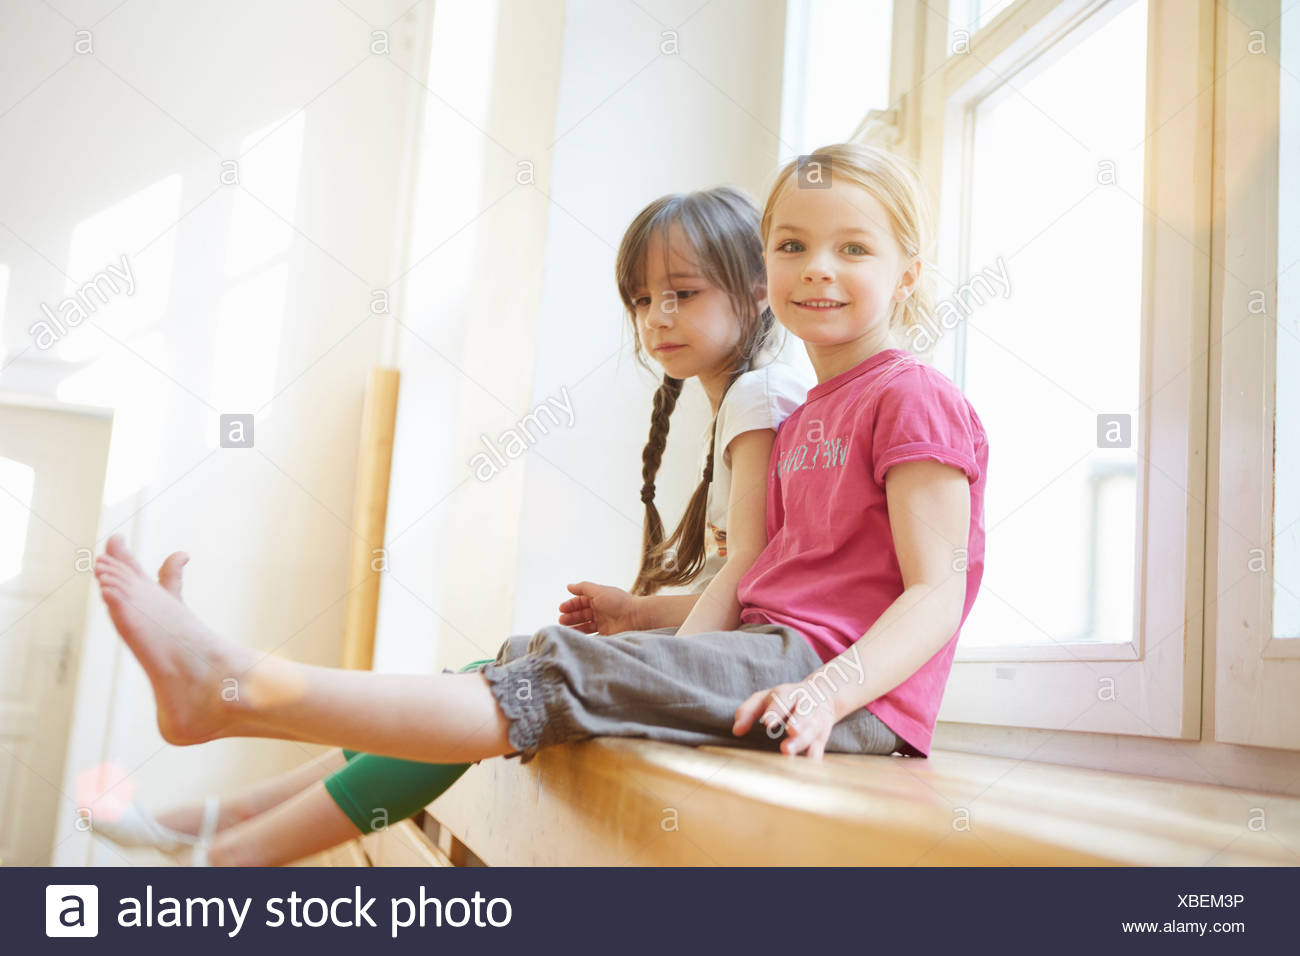 Mädchen sitzen auf Apparate, Aula Stockbild